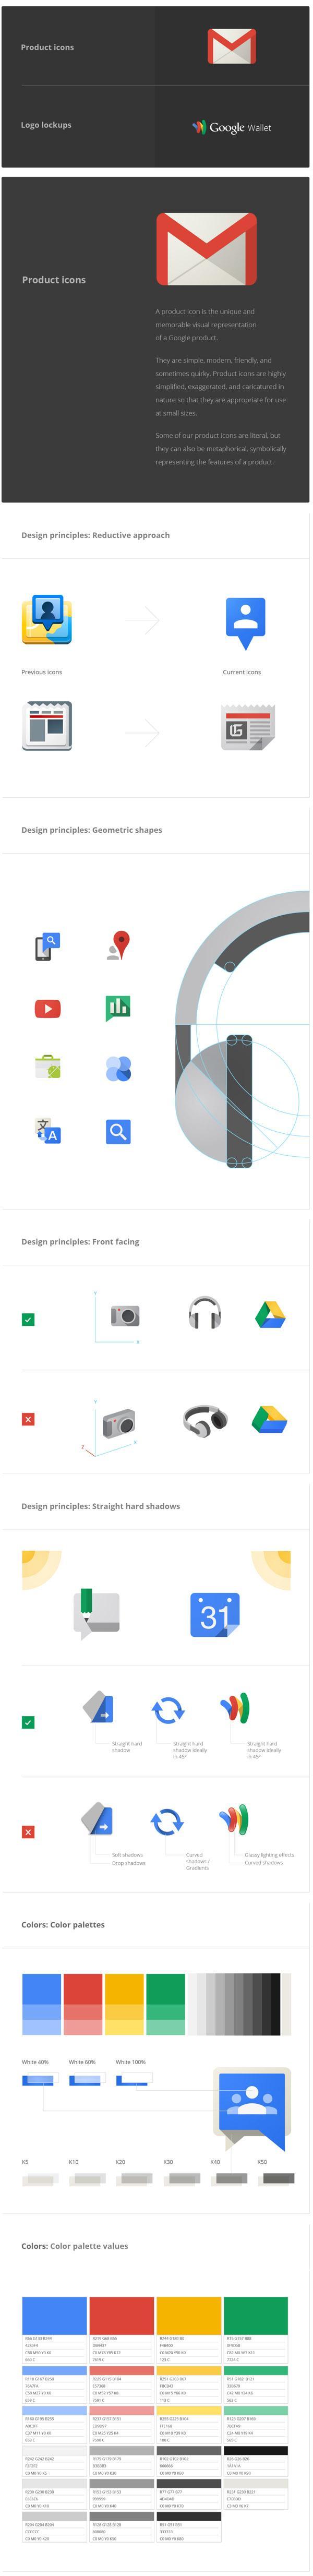 Google-Kurumsal-Kimlik-1